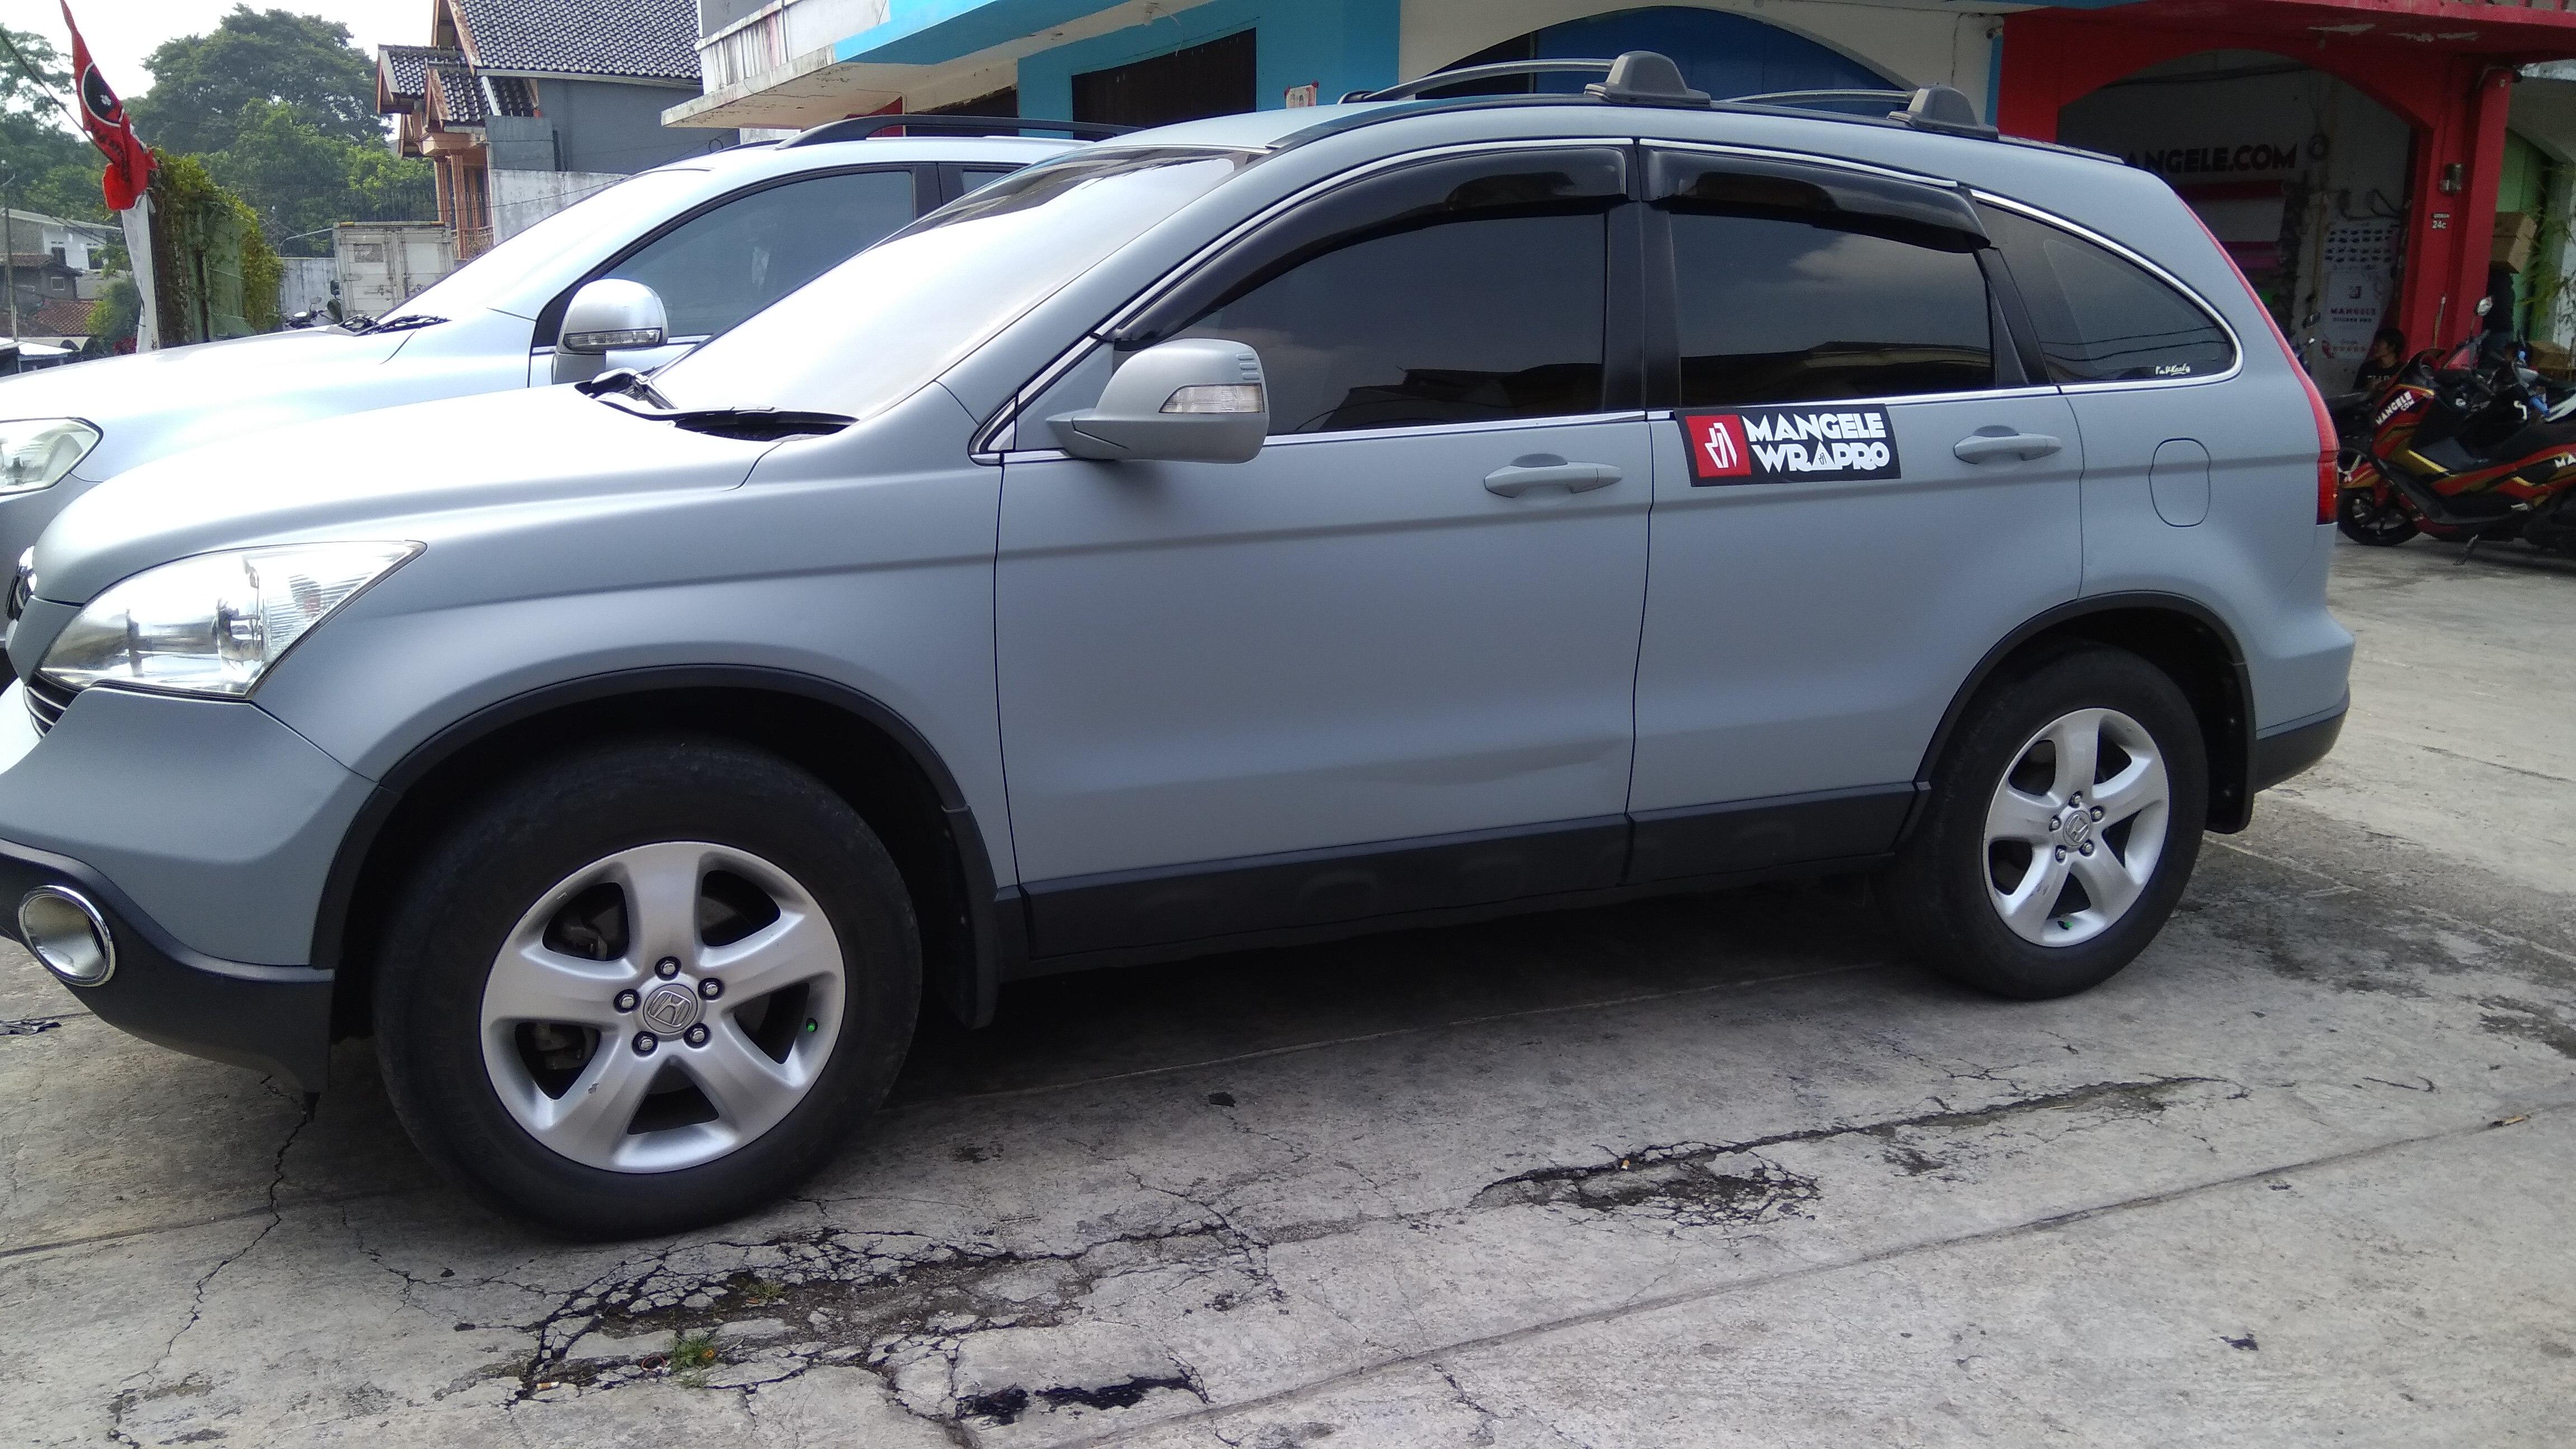 wrapping stiker mobil | Abu Doff Stiker CRV di Bandung | mangele stiker 081227722792